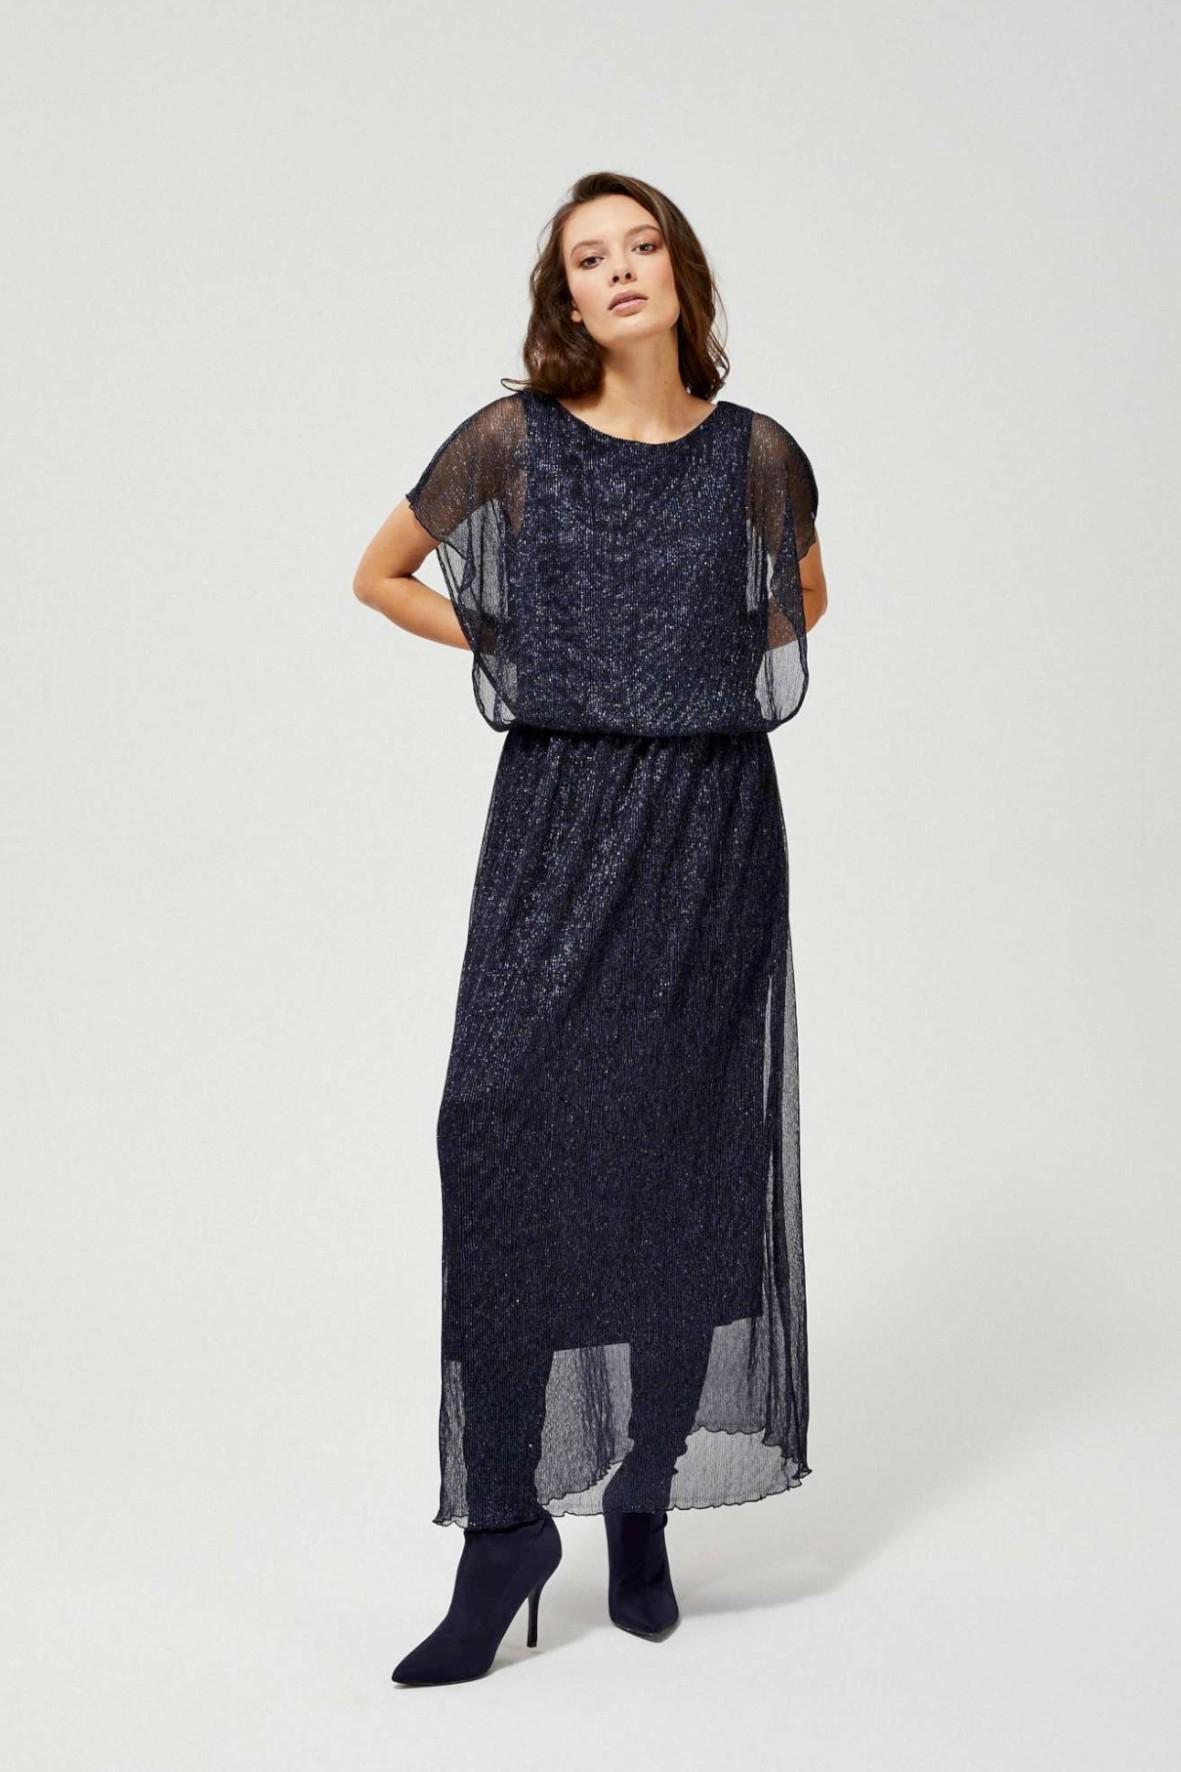 Długa zwiewna sukienka damska granatowa